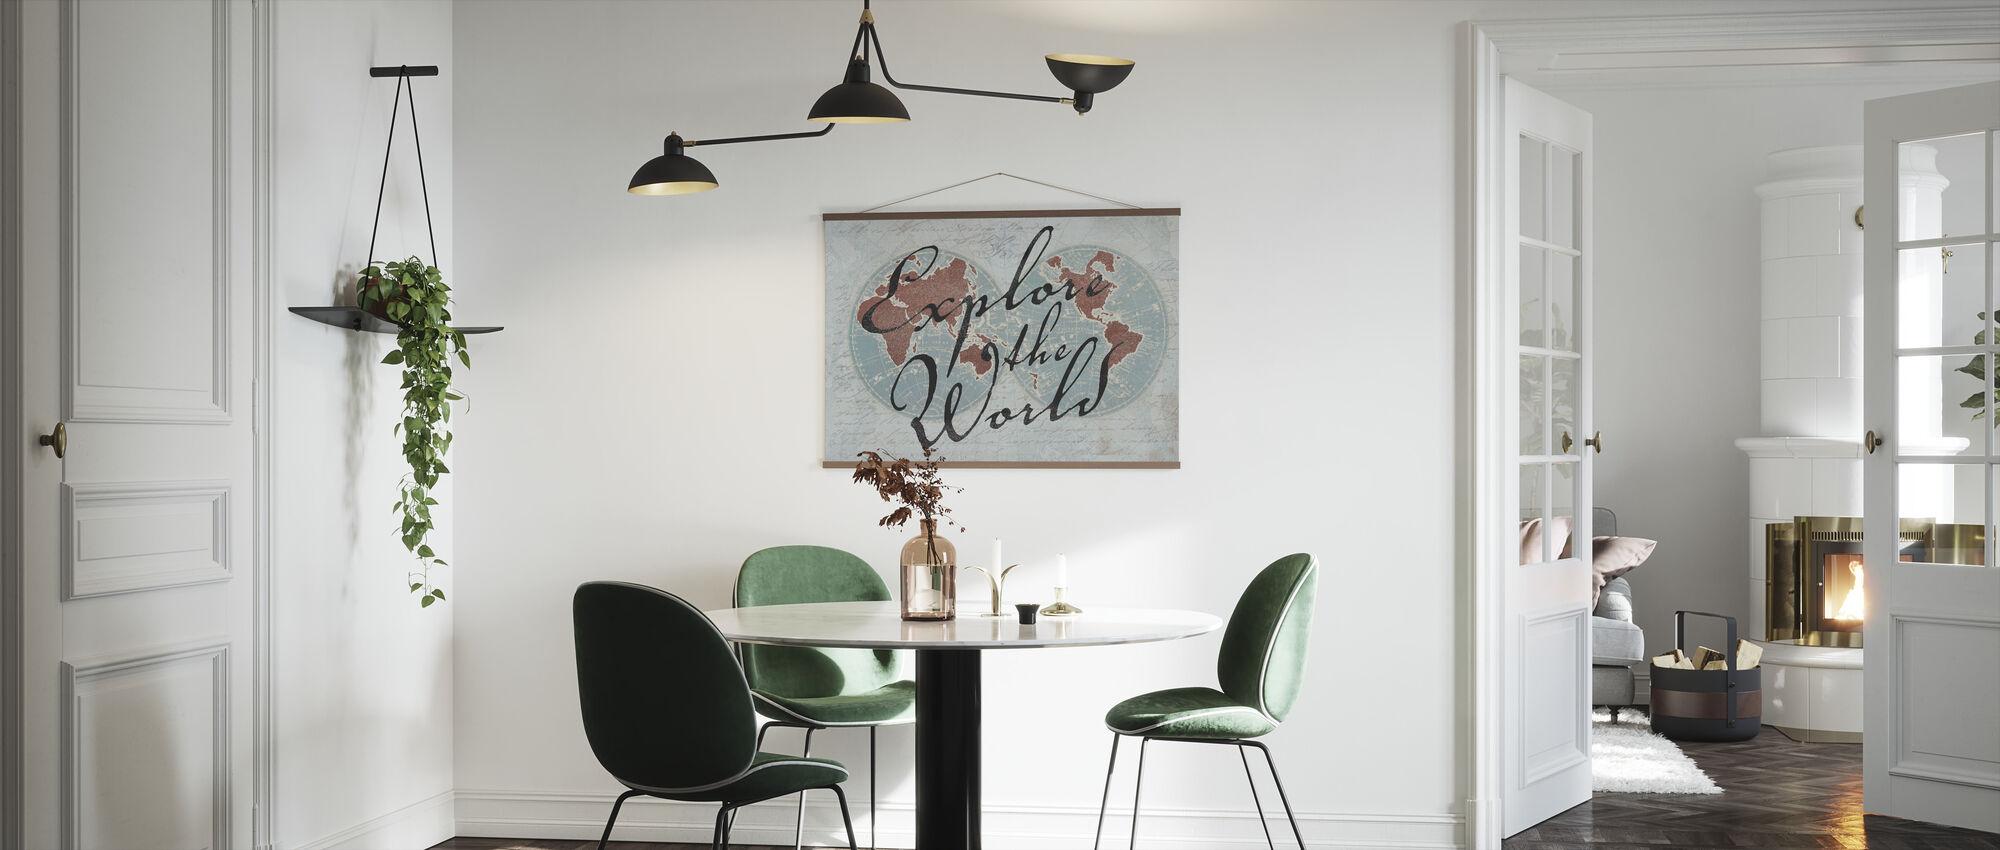 Explore the World 3 - Poster - Kitchen